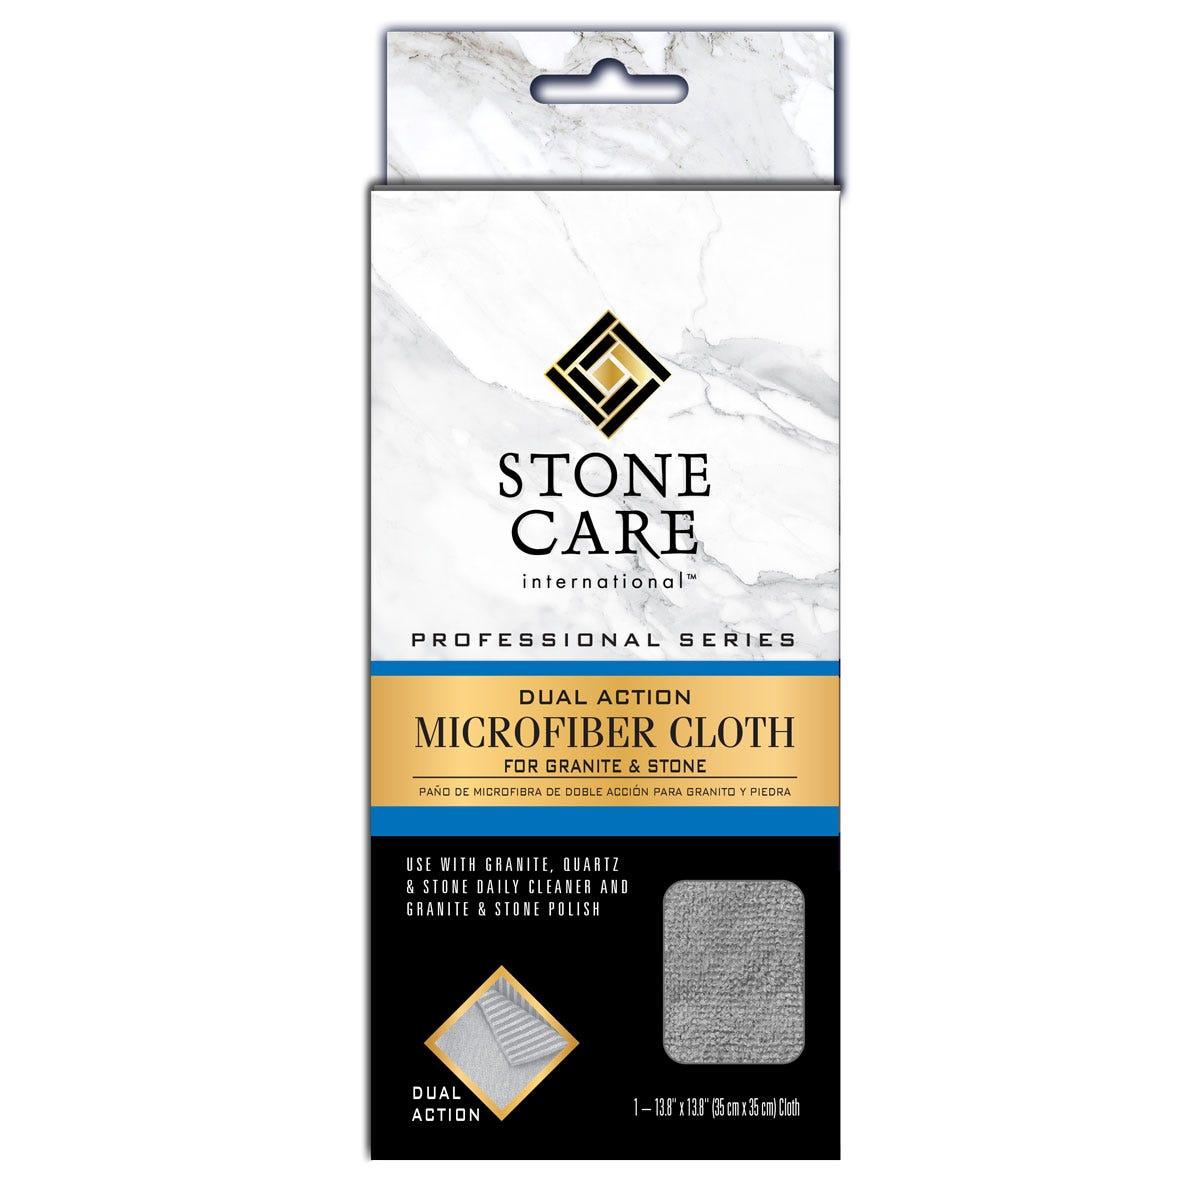 SCI Dual Action Microfiber Cloth for Granite & Stone